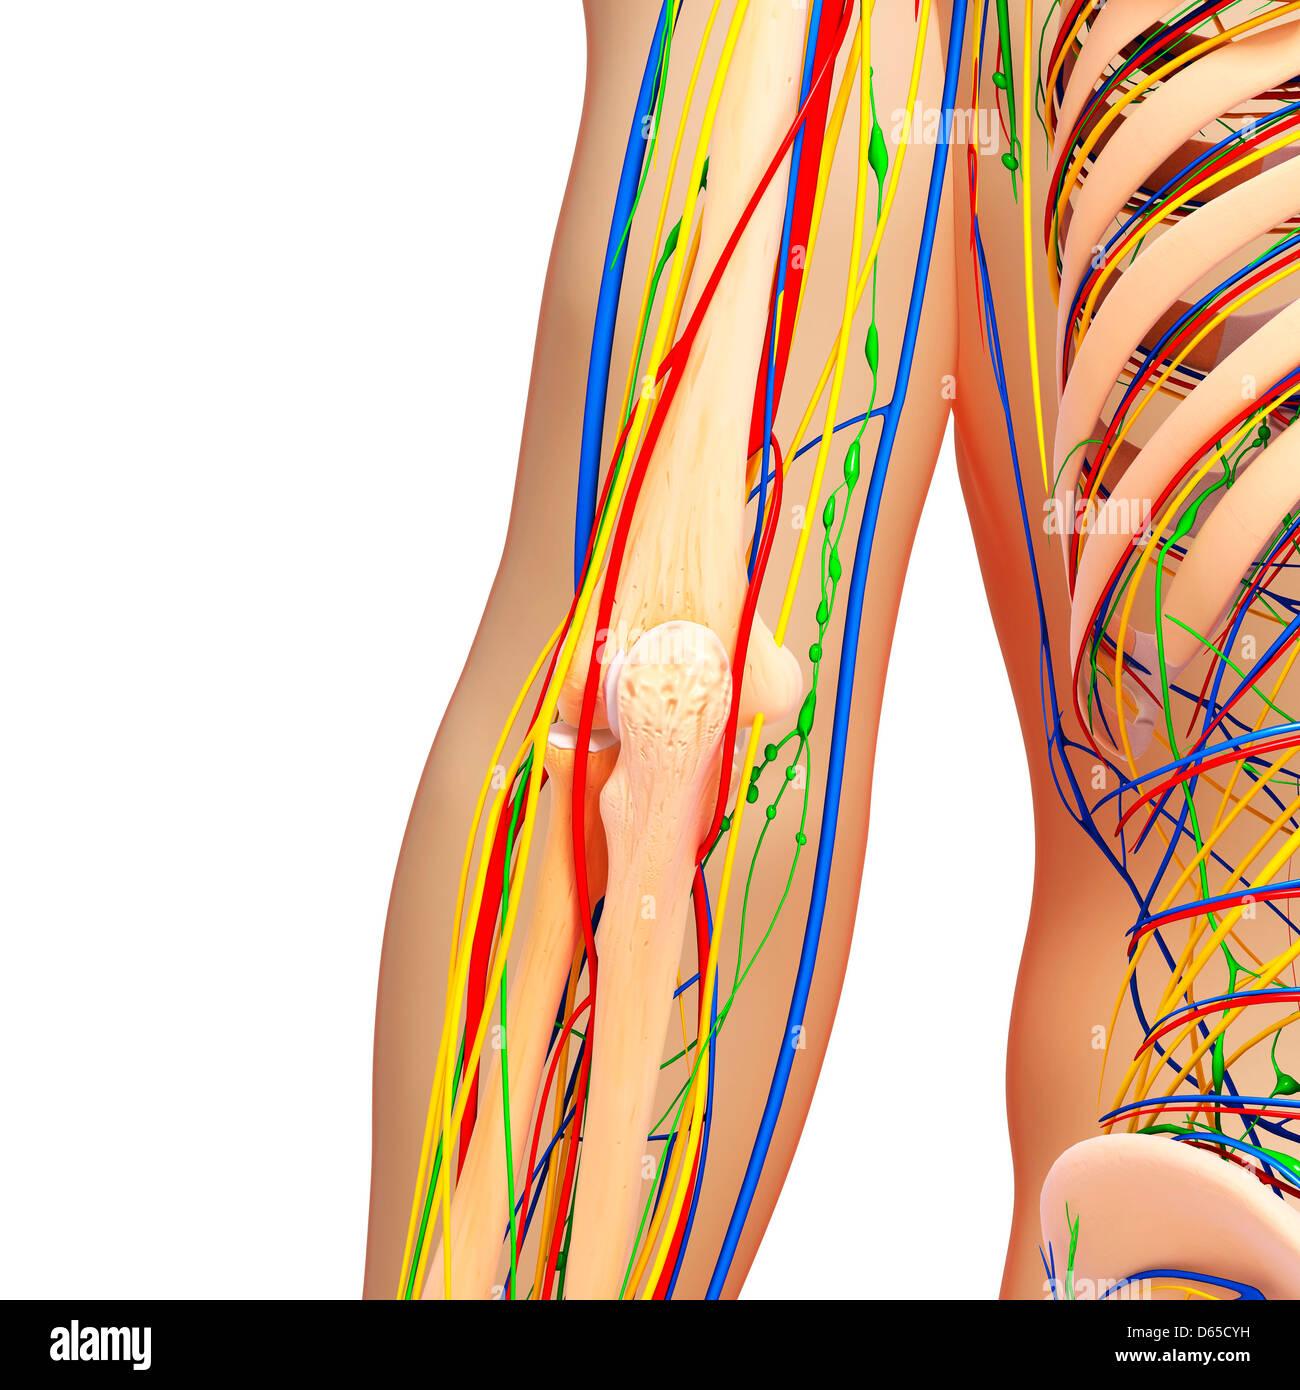 Arm Artery Stockfotos & Arm Artery Bilder - Alamy